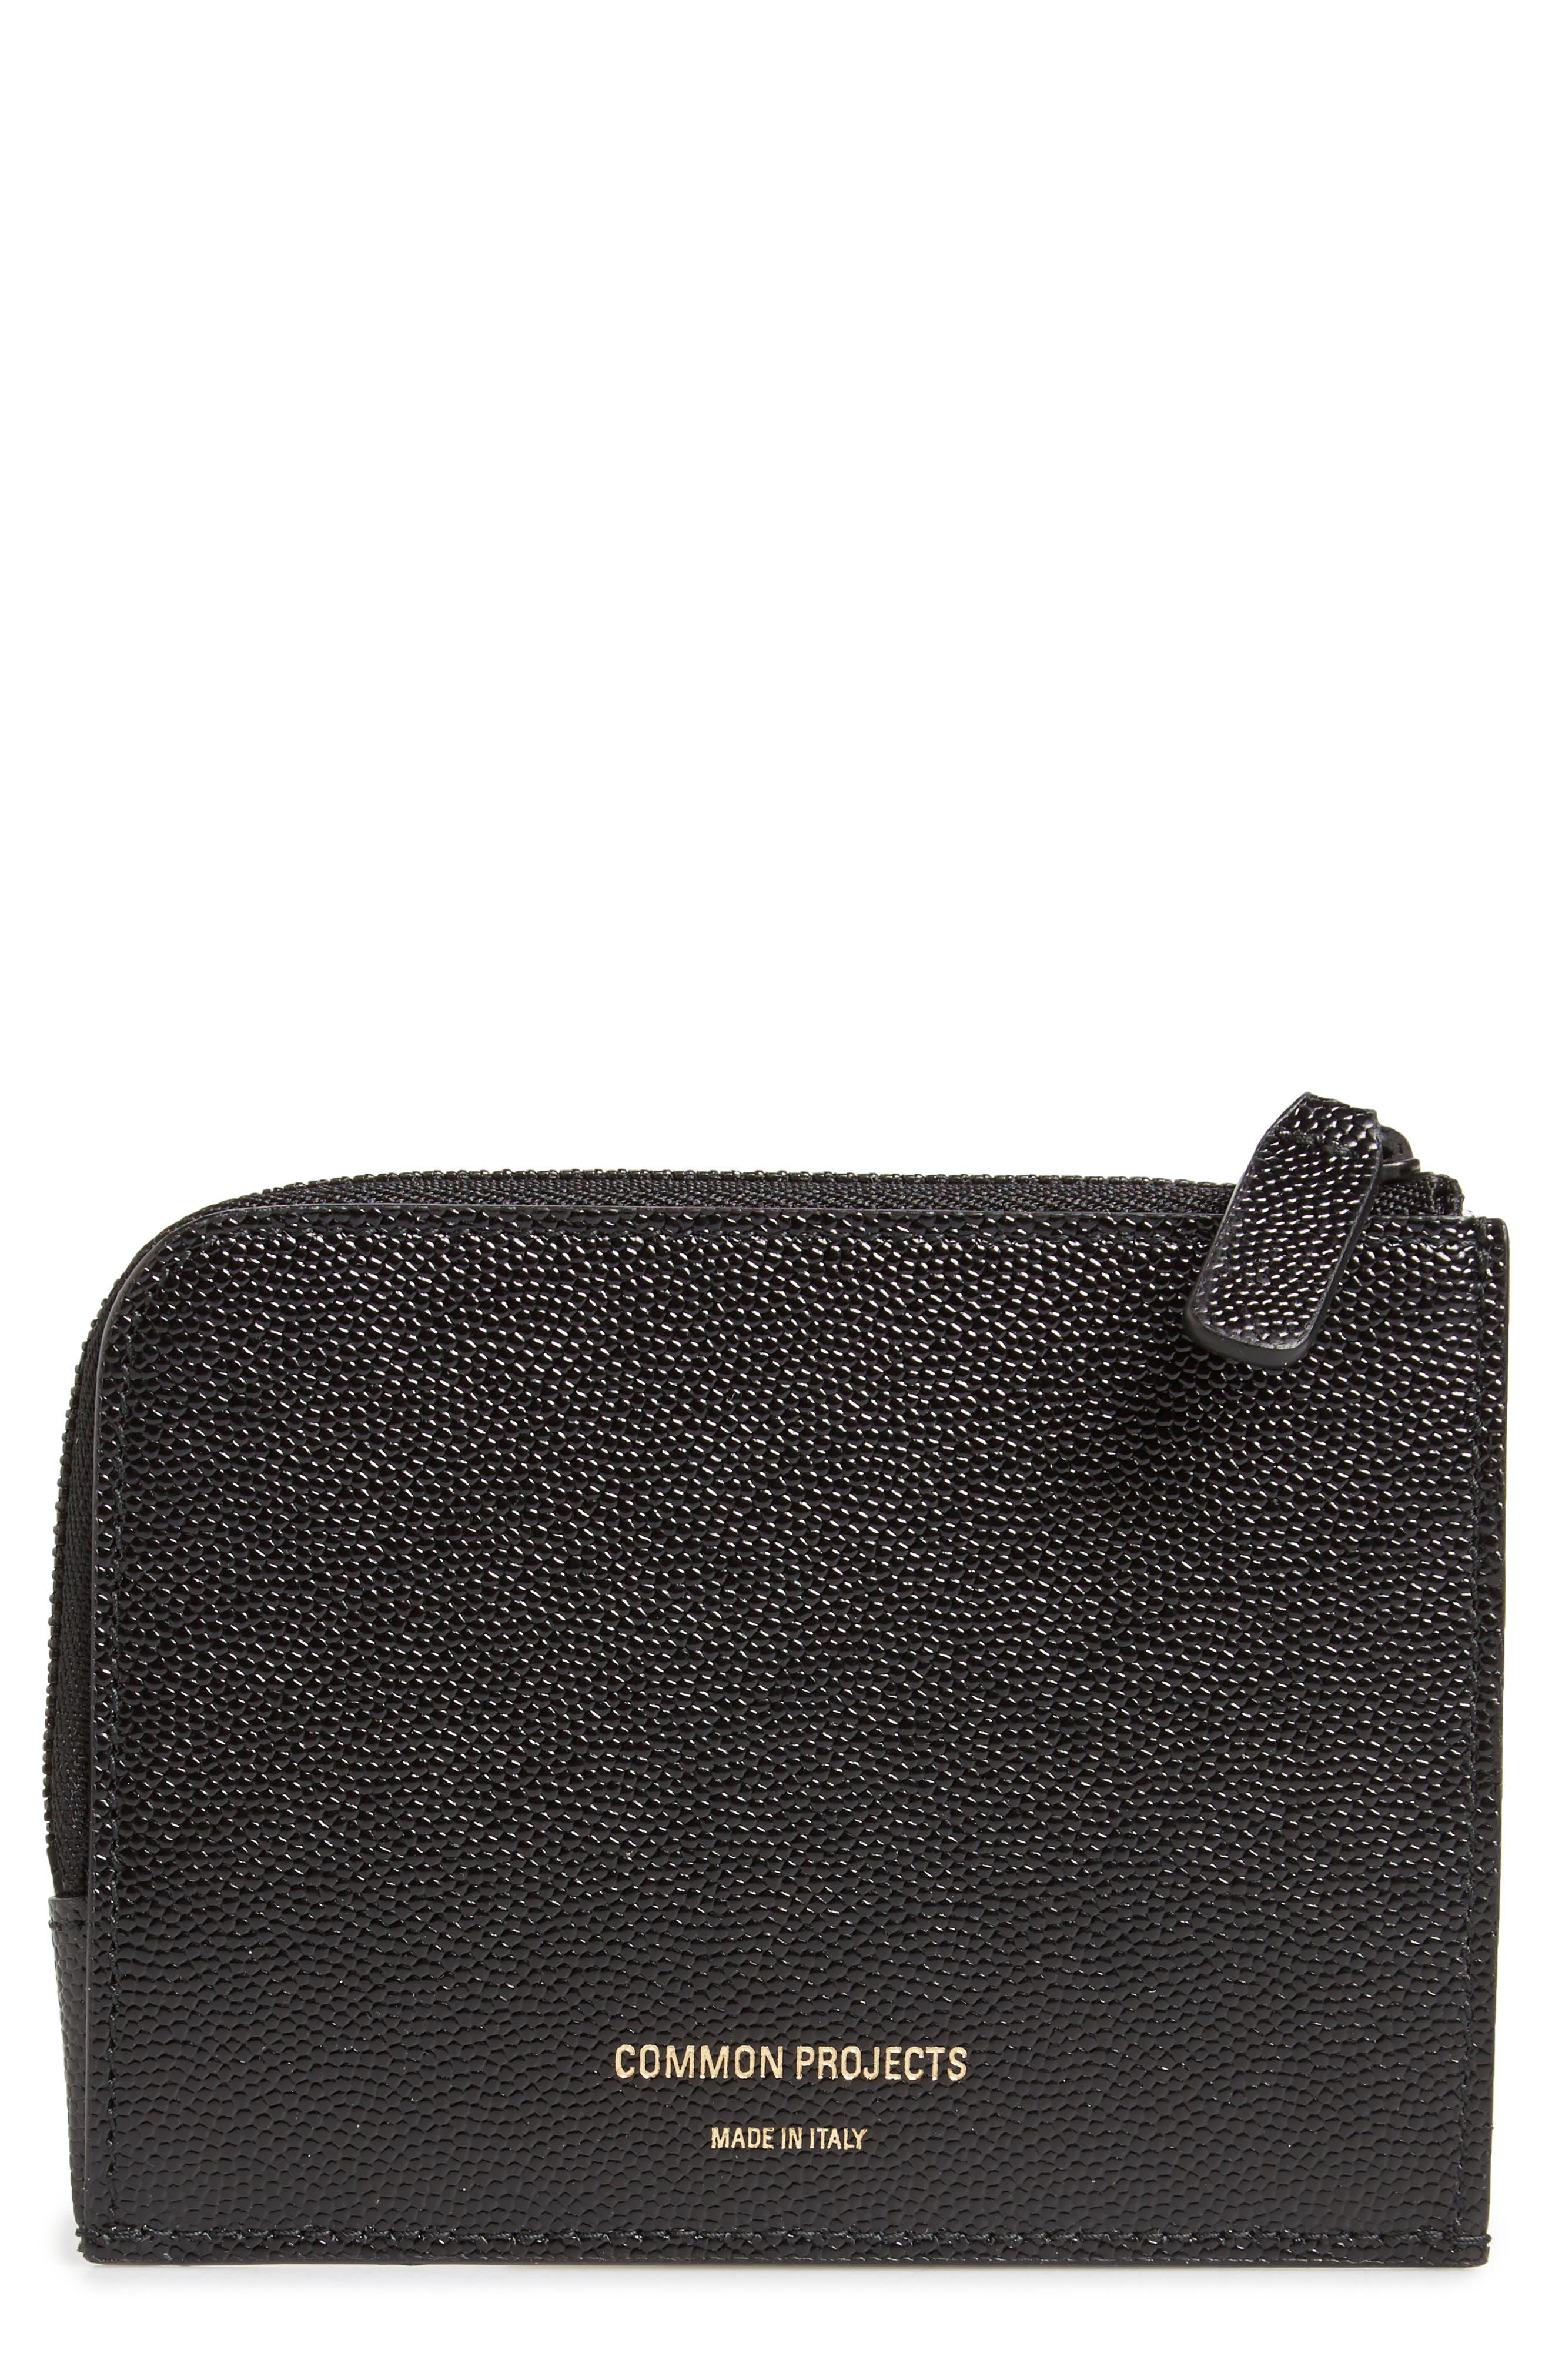 Pebble Leather Zip Wallet,                         Main,                         color, 001